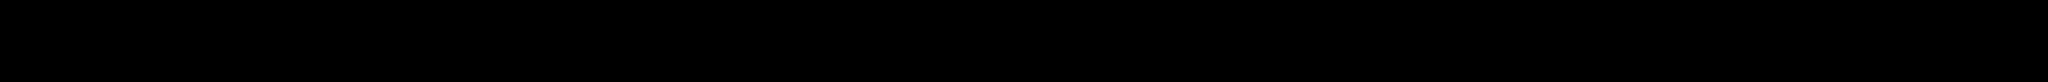 CHAMPION A323R Viskerblad